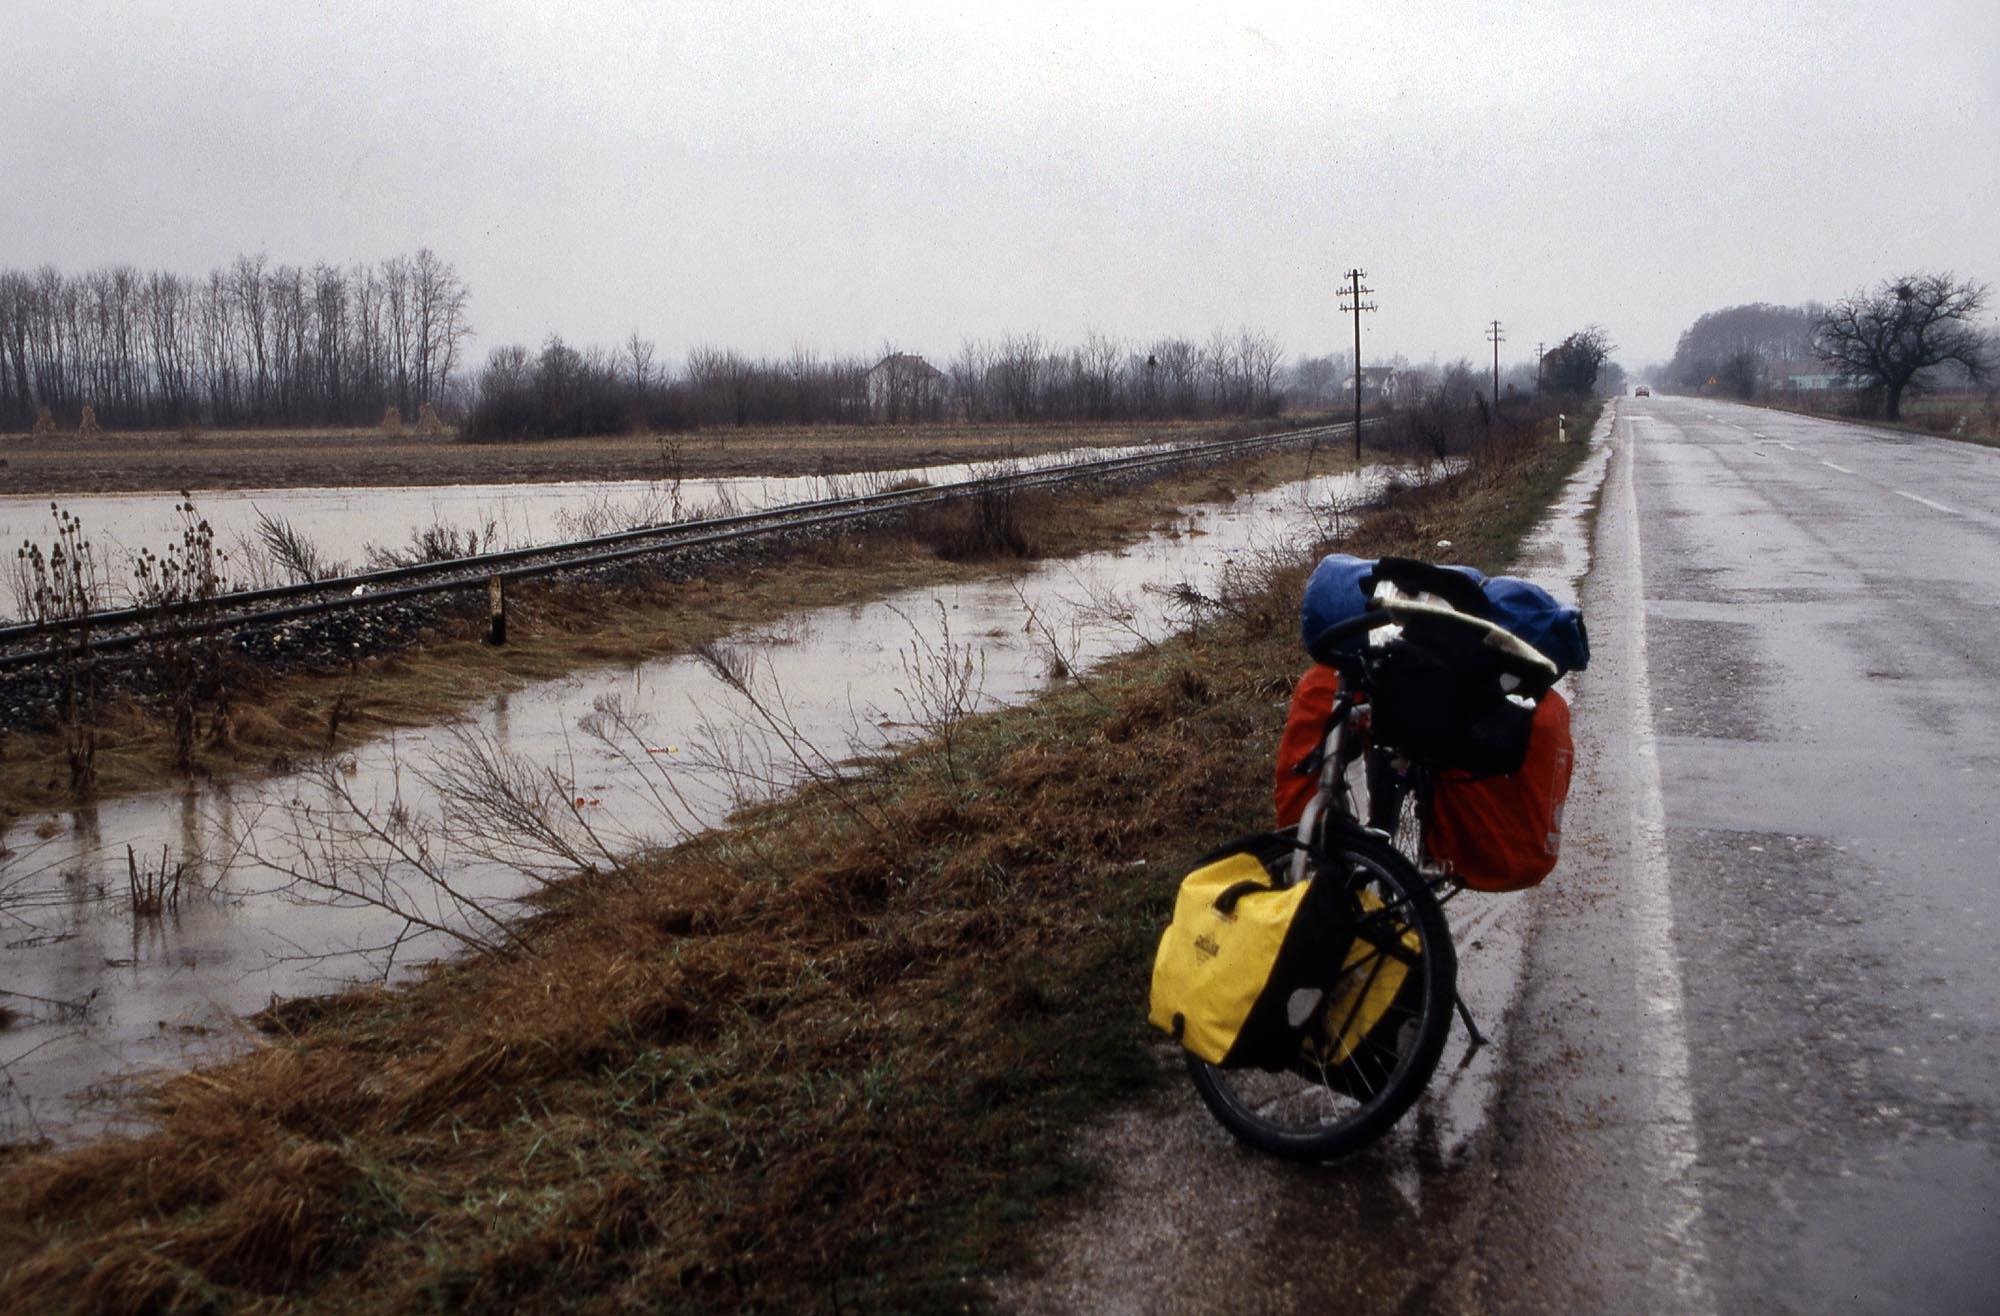 serbien-ueberflutet-regen-small